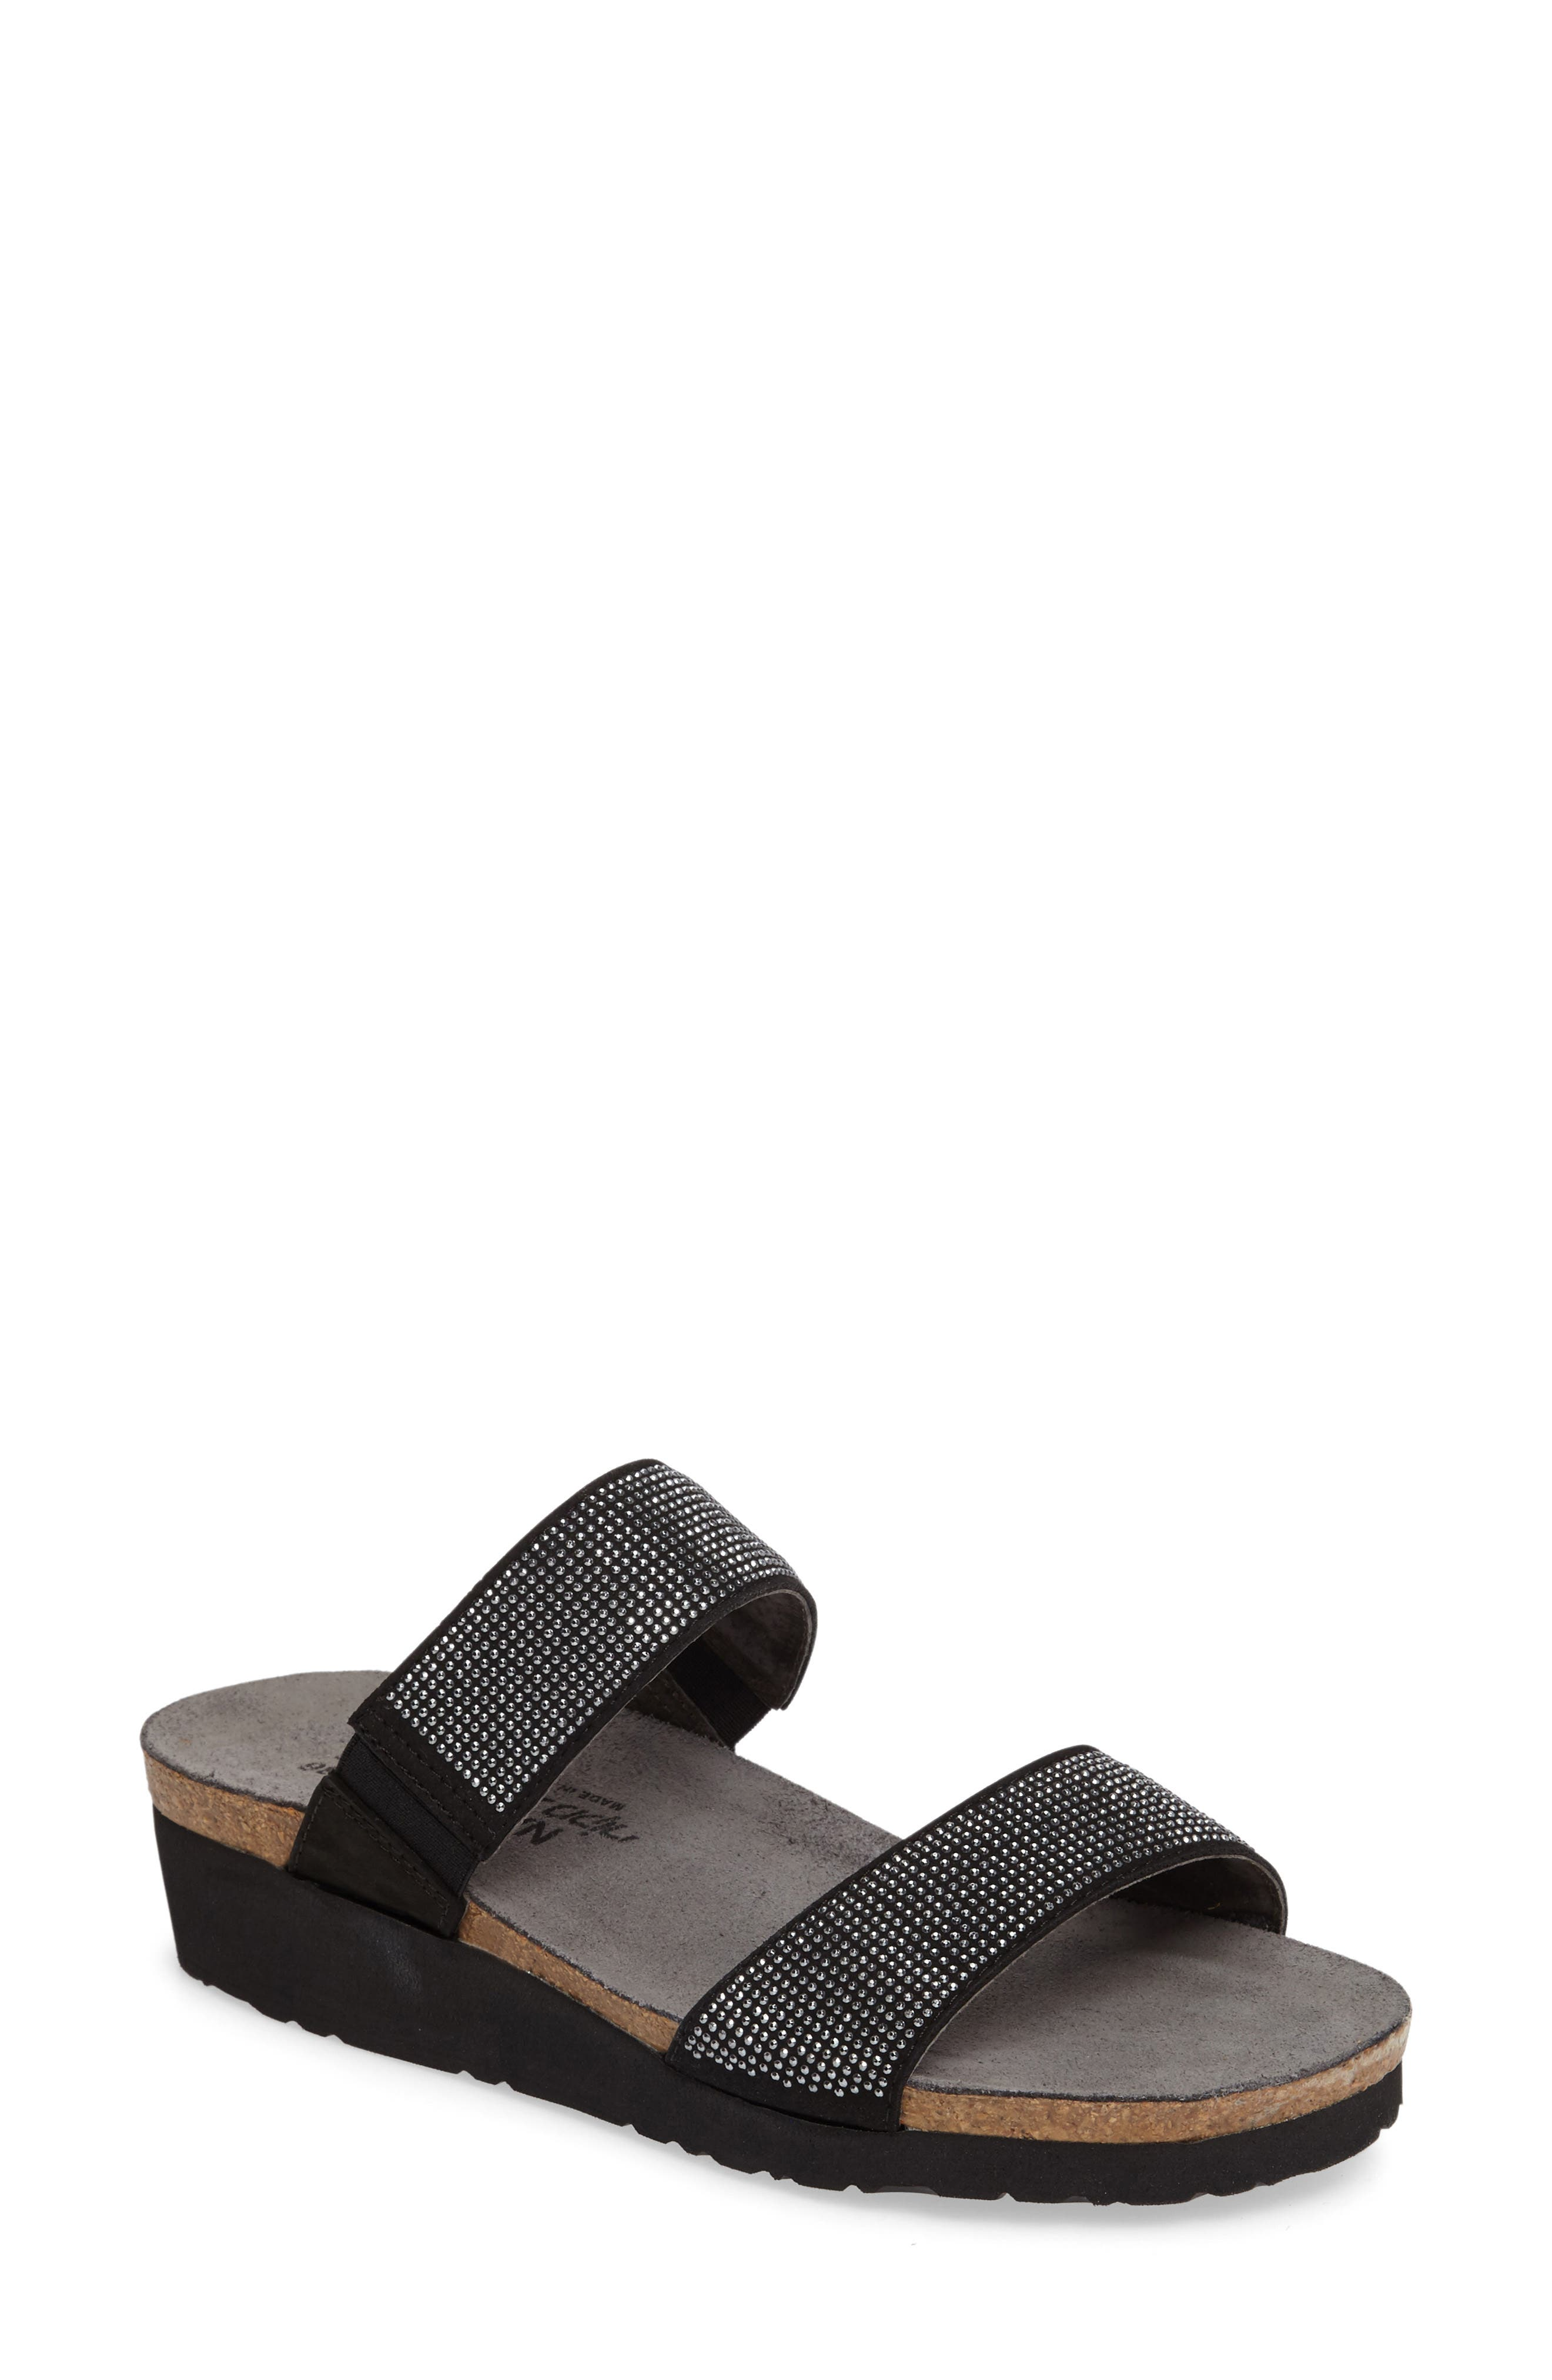 'Bianca' Slide Sandal,                             Main thumbnail 1, color,                             BLACK LEATHER